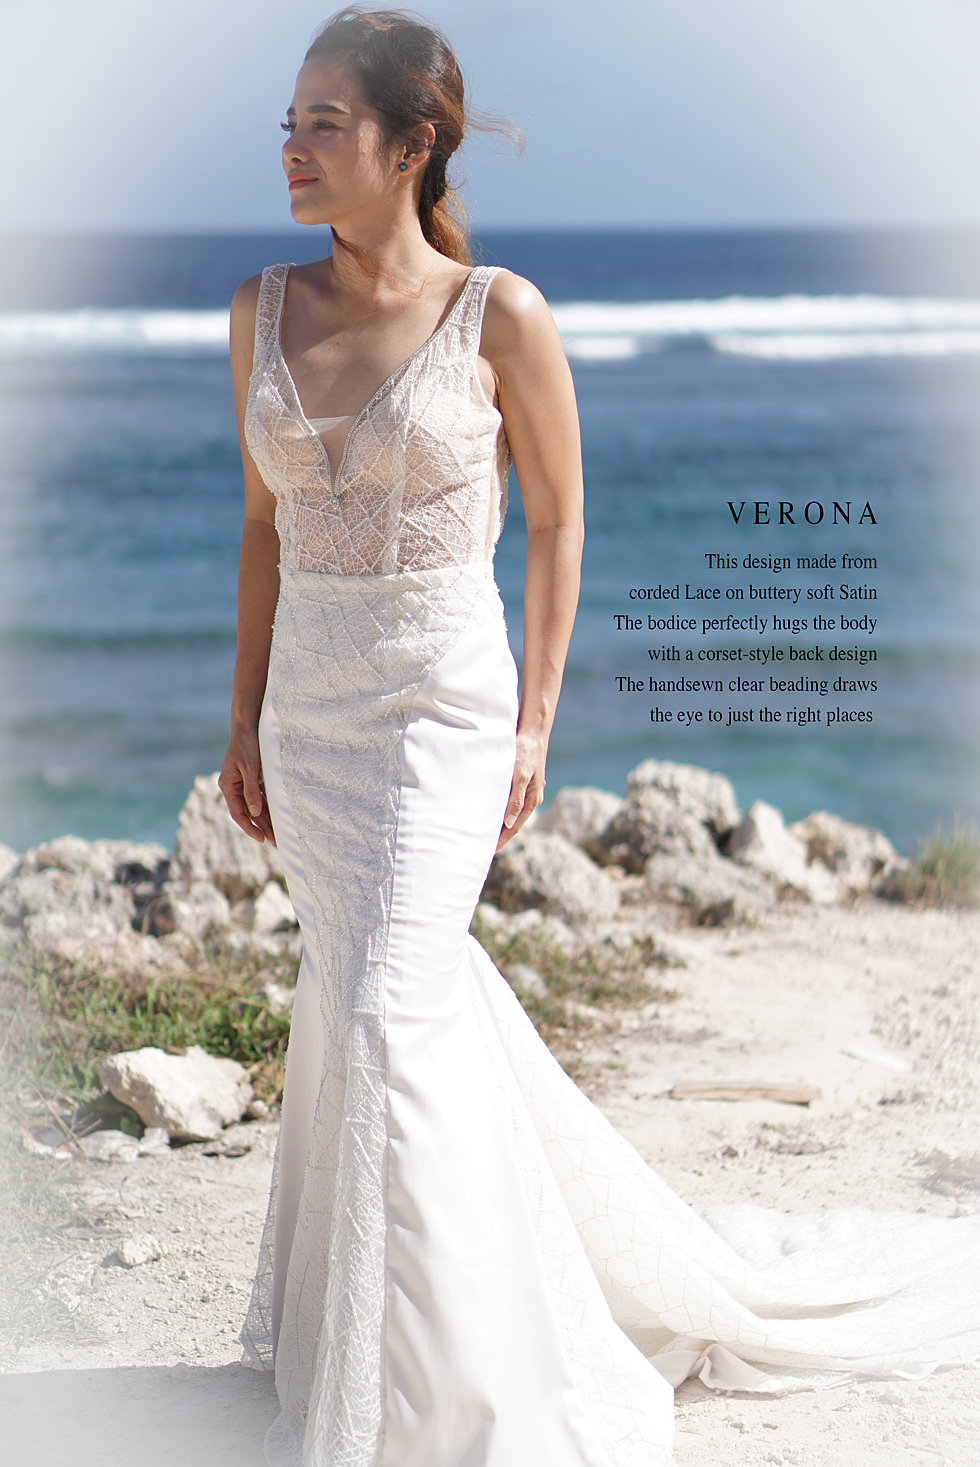 BALI / BRIDAL / WEDDING DRESSES / RENTAL and MADE TO ORDER | VERONA